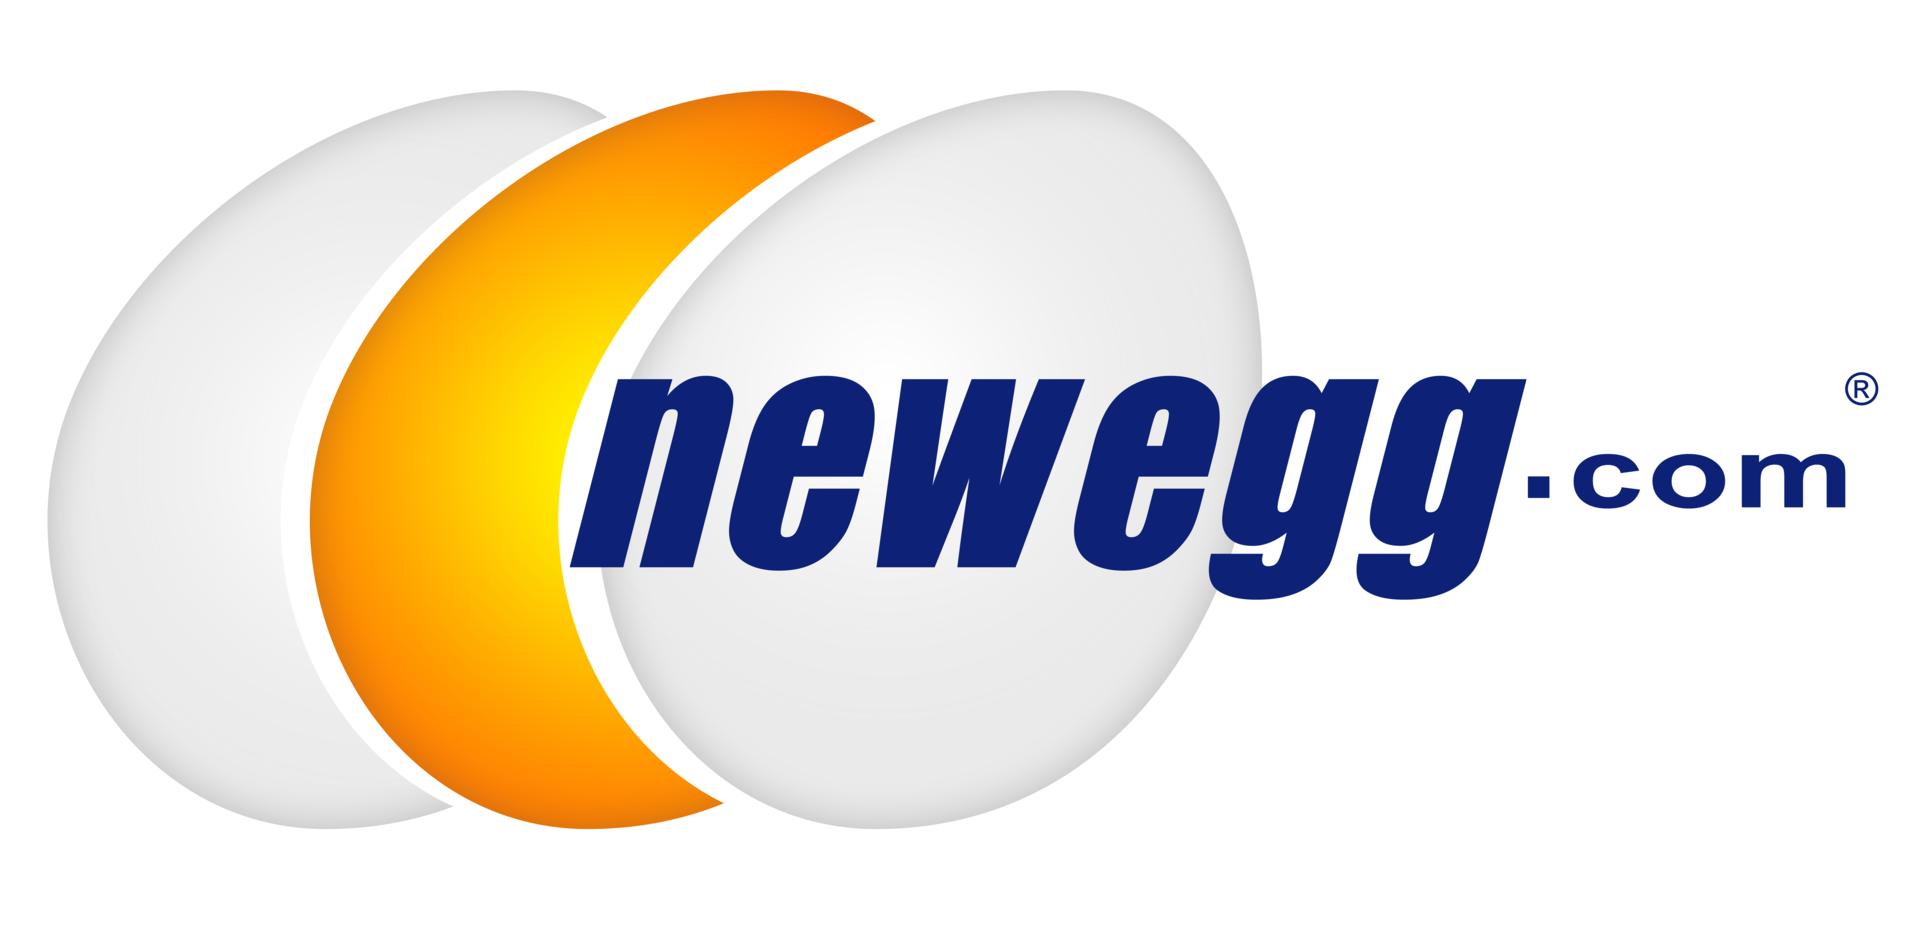 Microsoft accuses Newegg of selling pirated Windows 10 keys